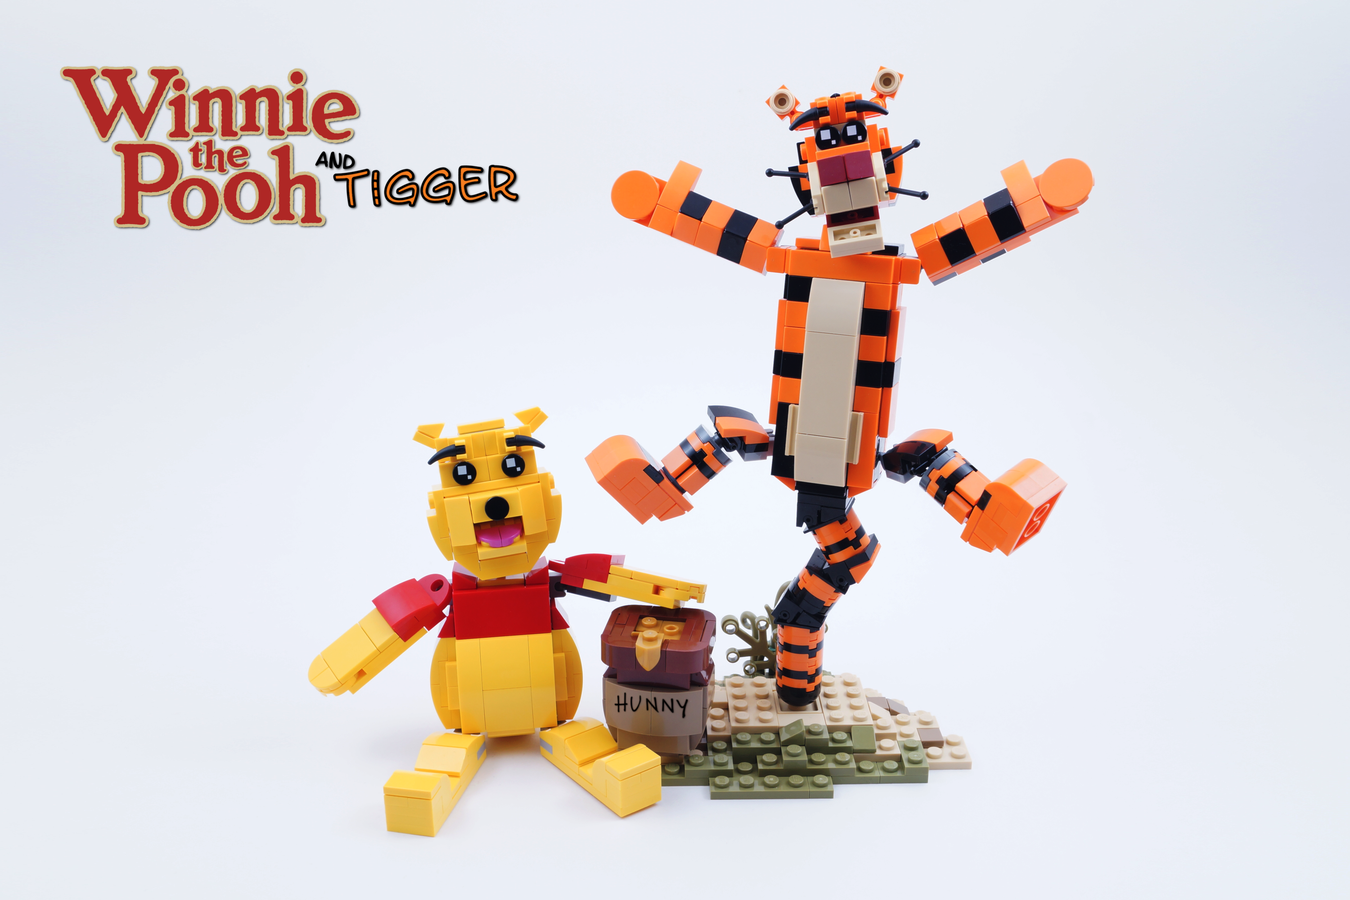 lego-ideas-winnie-the-pooh-and-tigger-brickinnick zusammengebaut.com